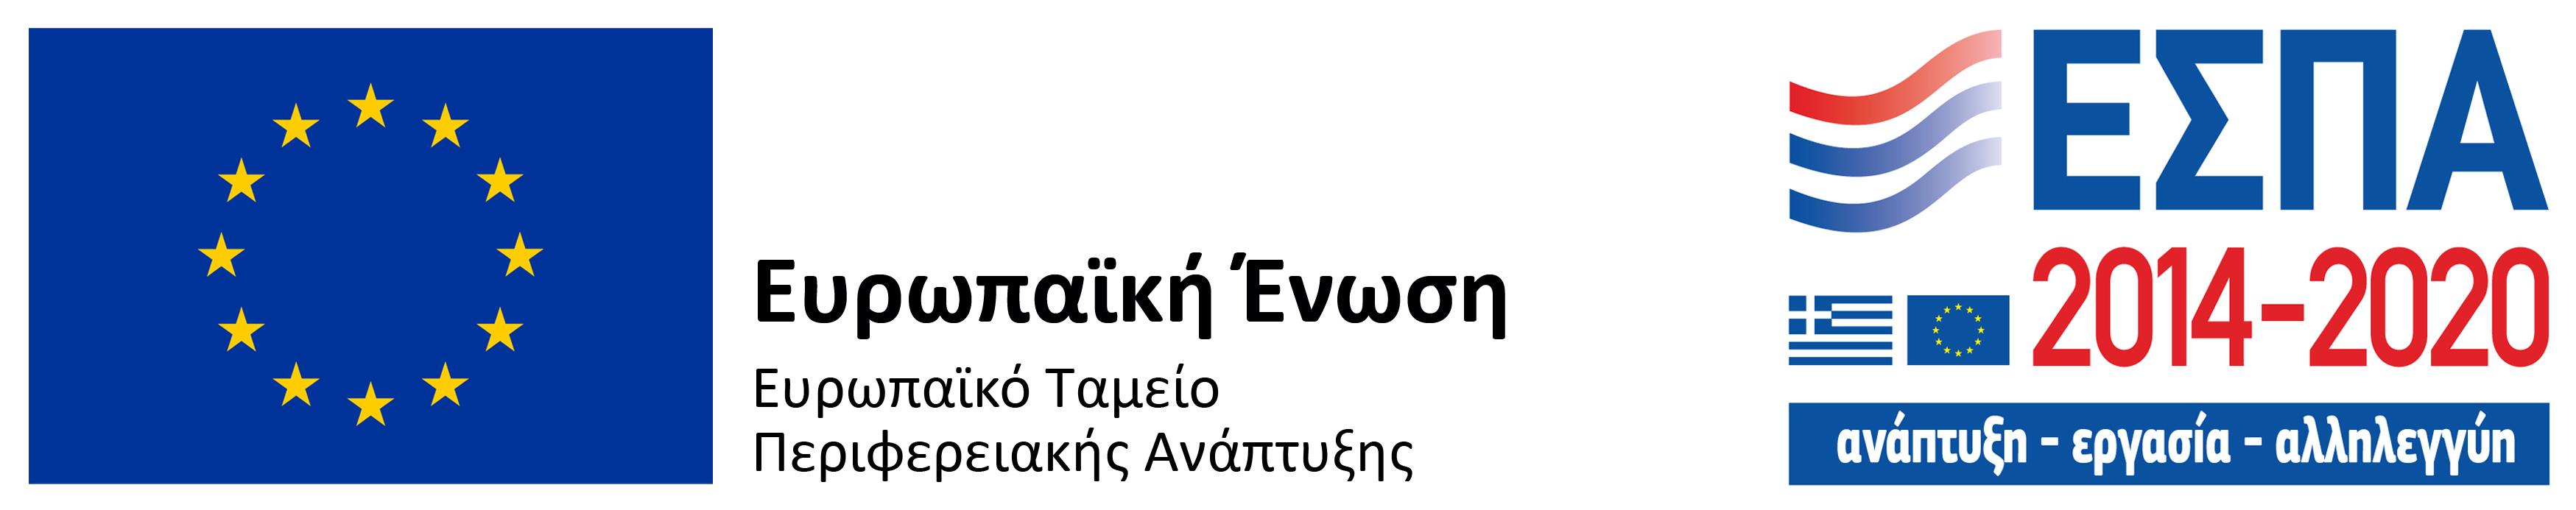 ESPA PDF